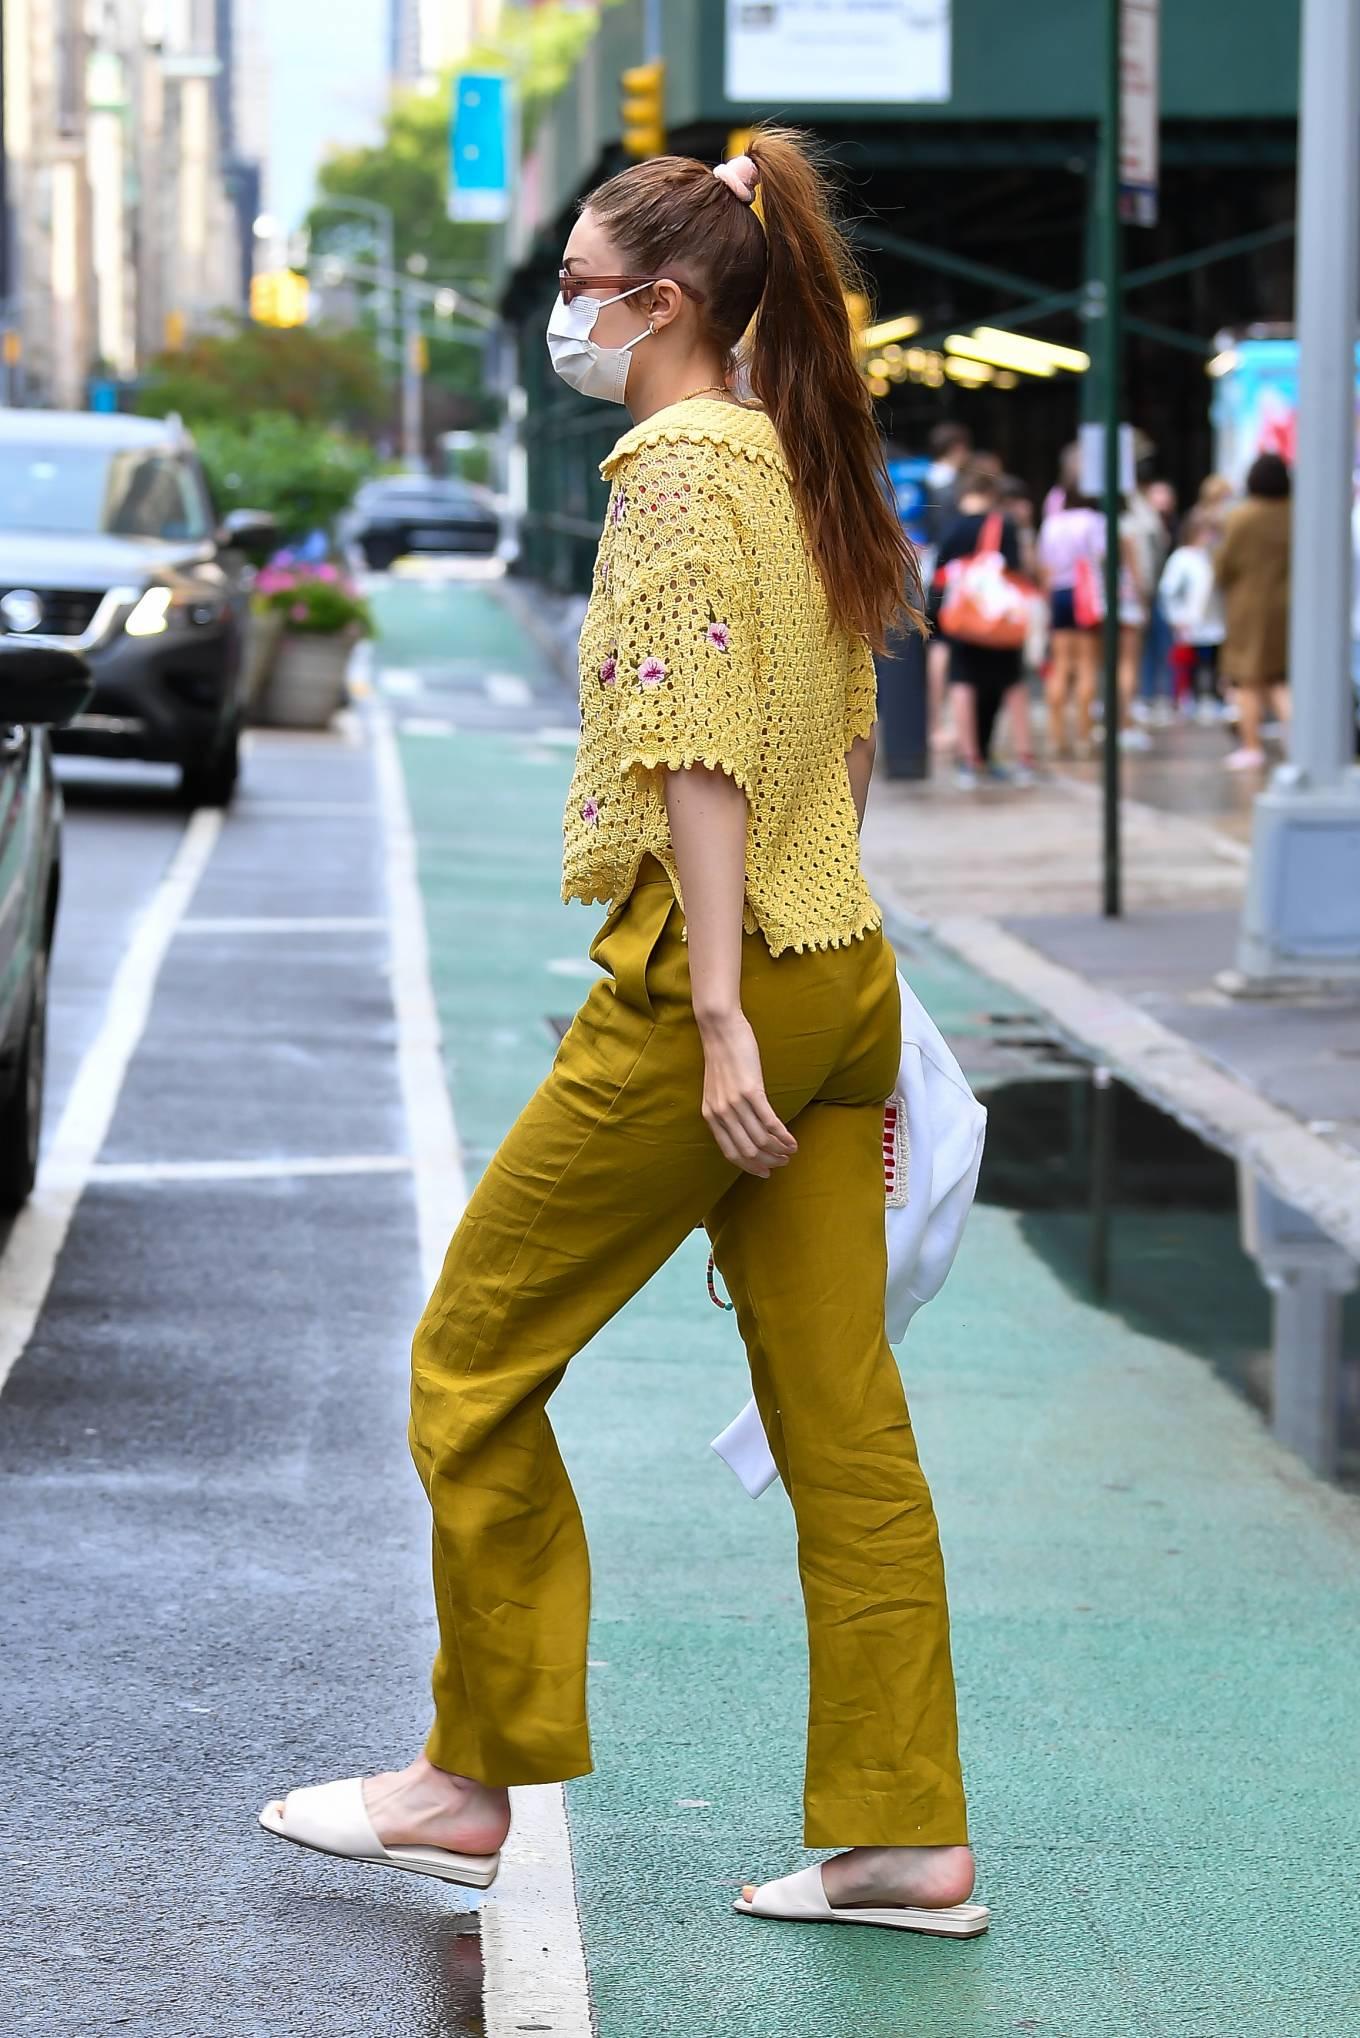 Gigi Hadid 2021 : Gigi Hadid – Heads to the salon in New York City-02